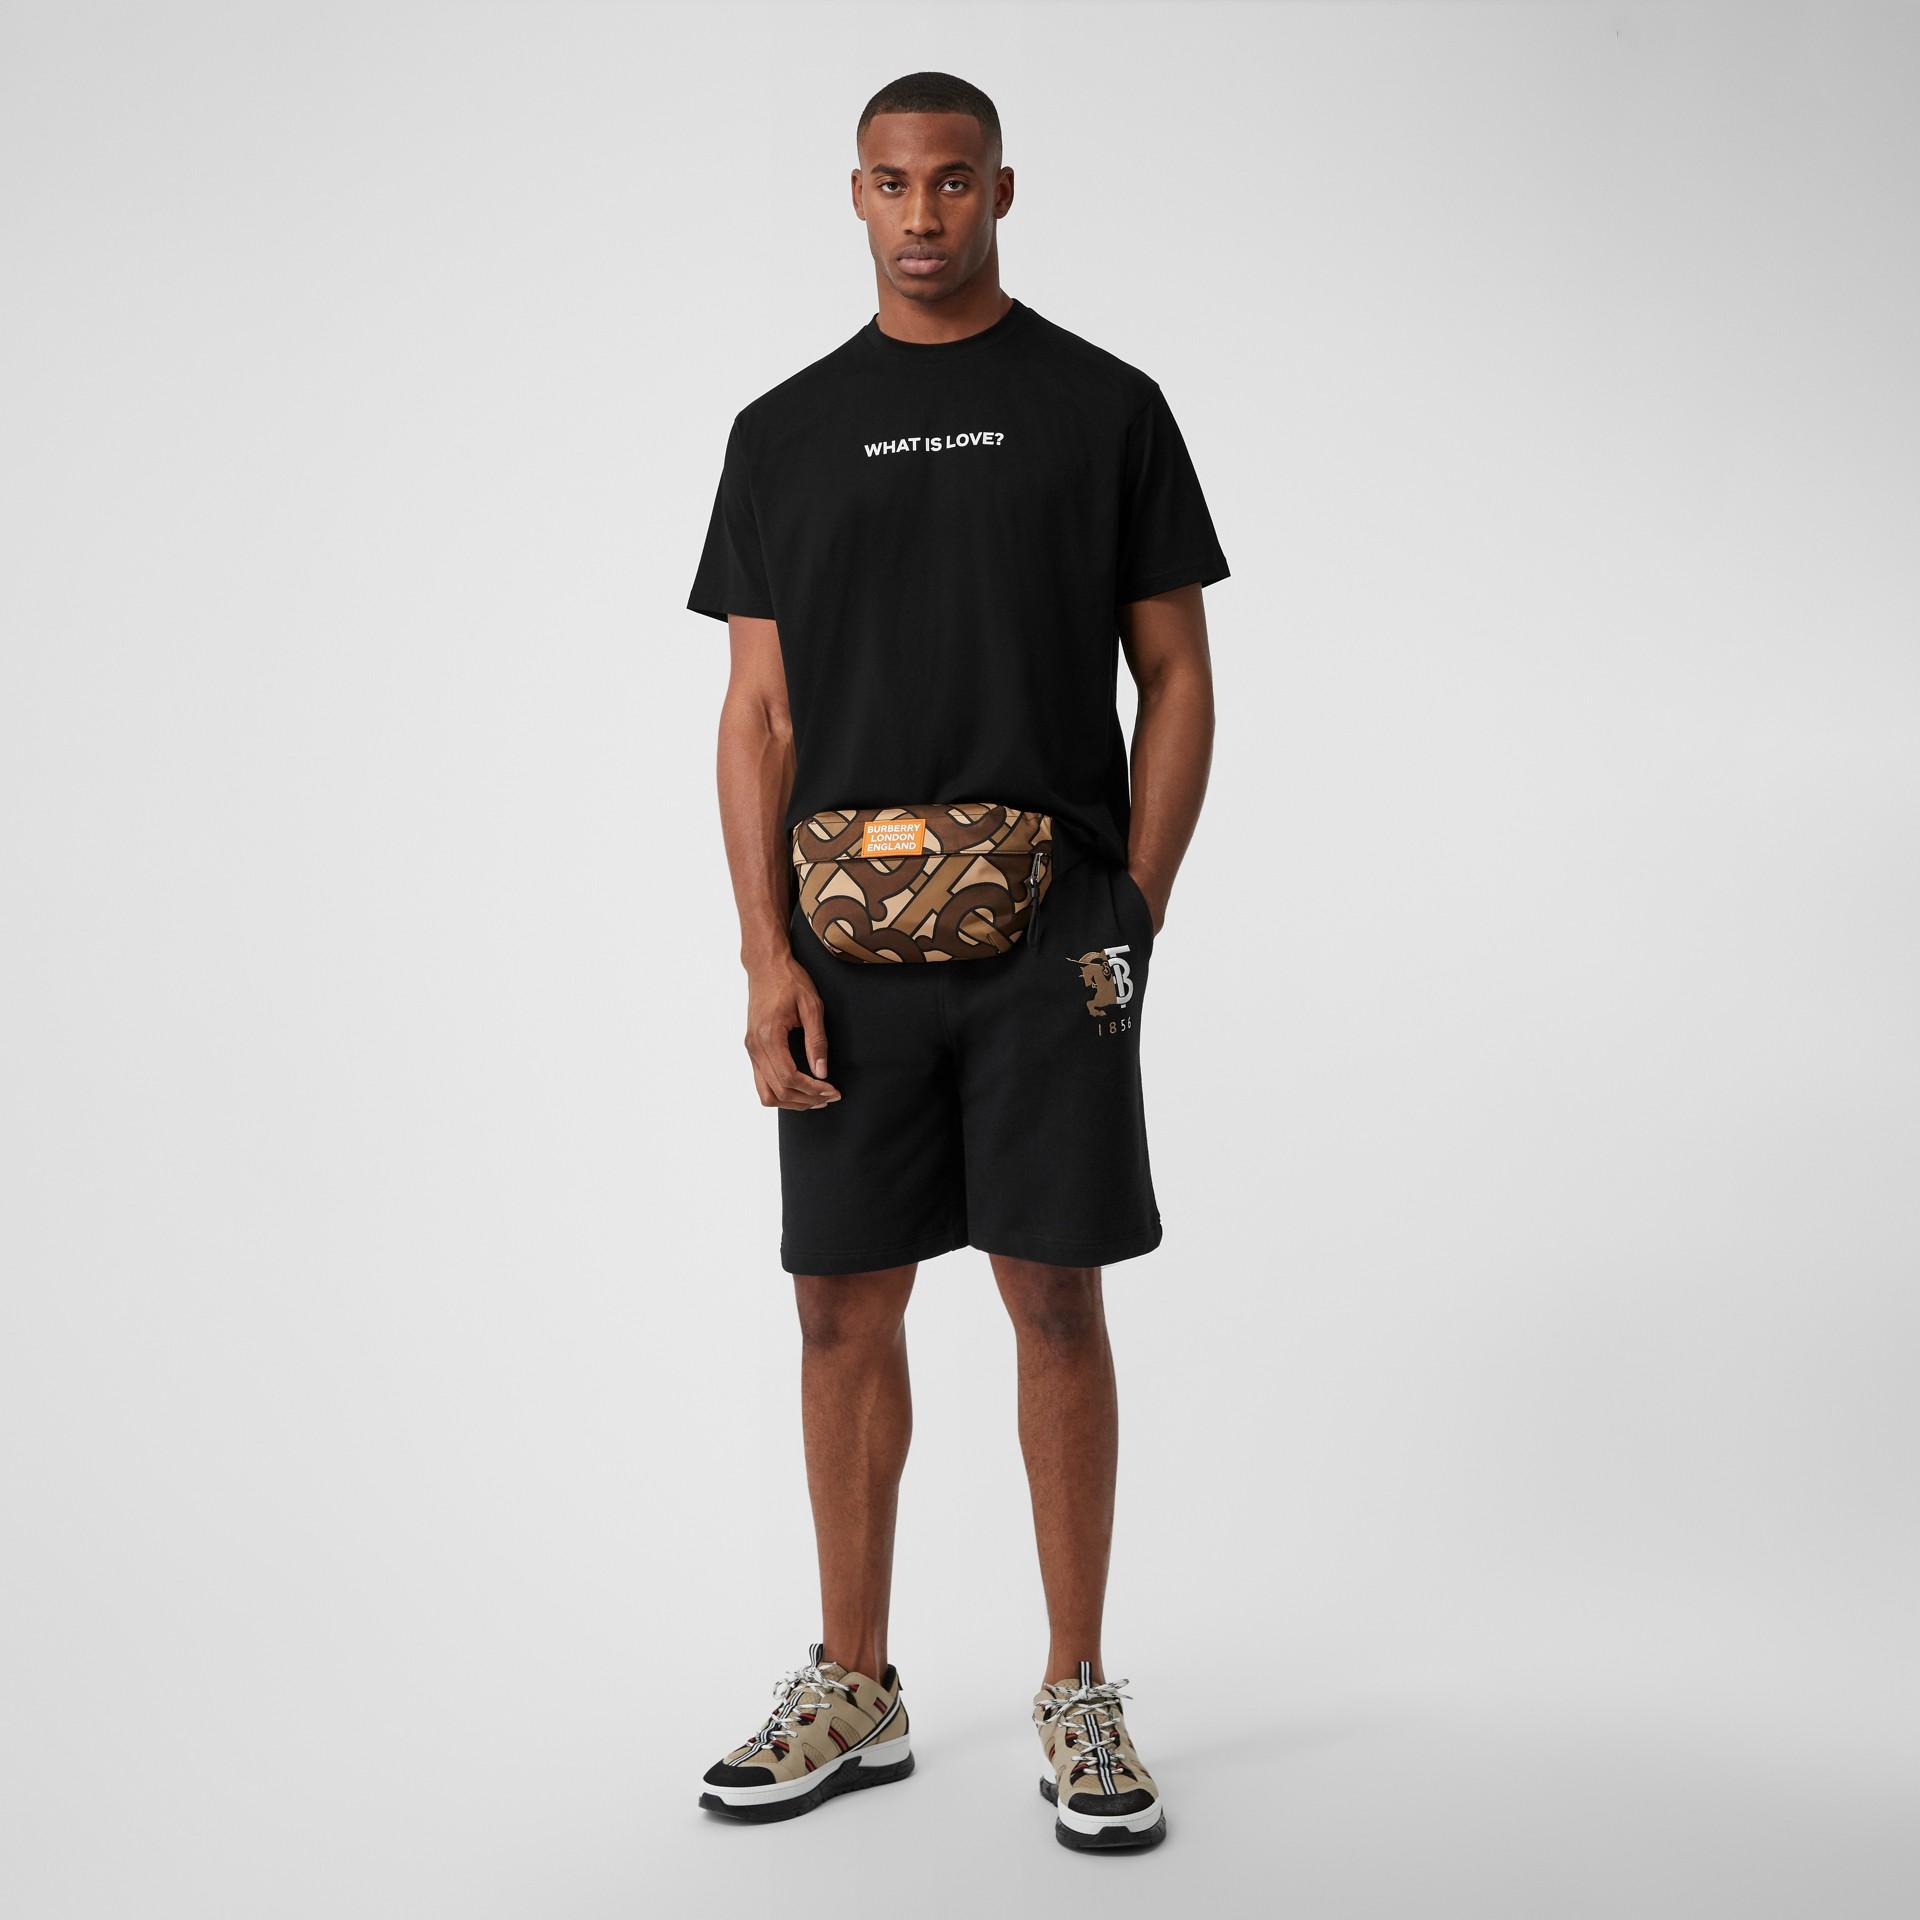 Love Slogan Cotton Oversized T-shirt in Black - Men | Burberry United Kingdom - gallery image 5